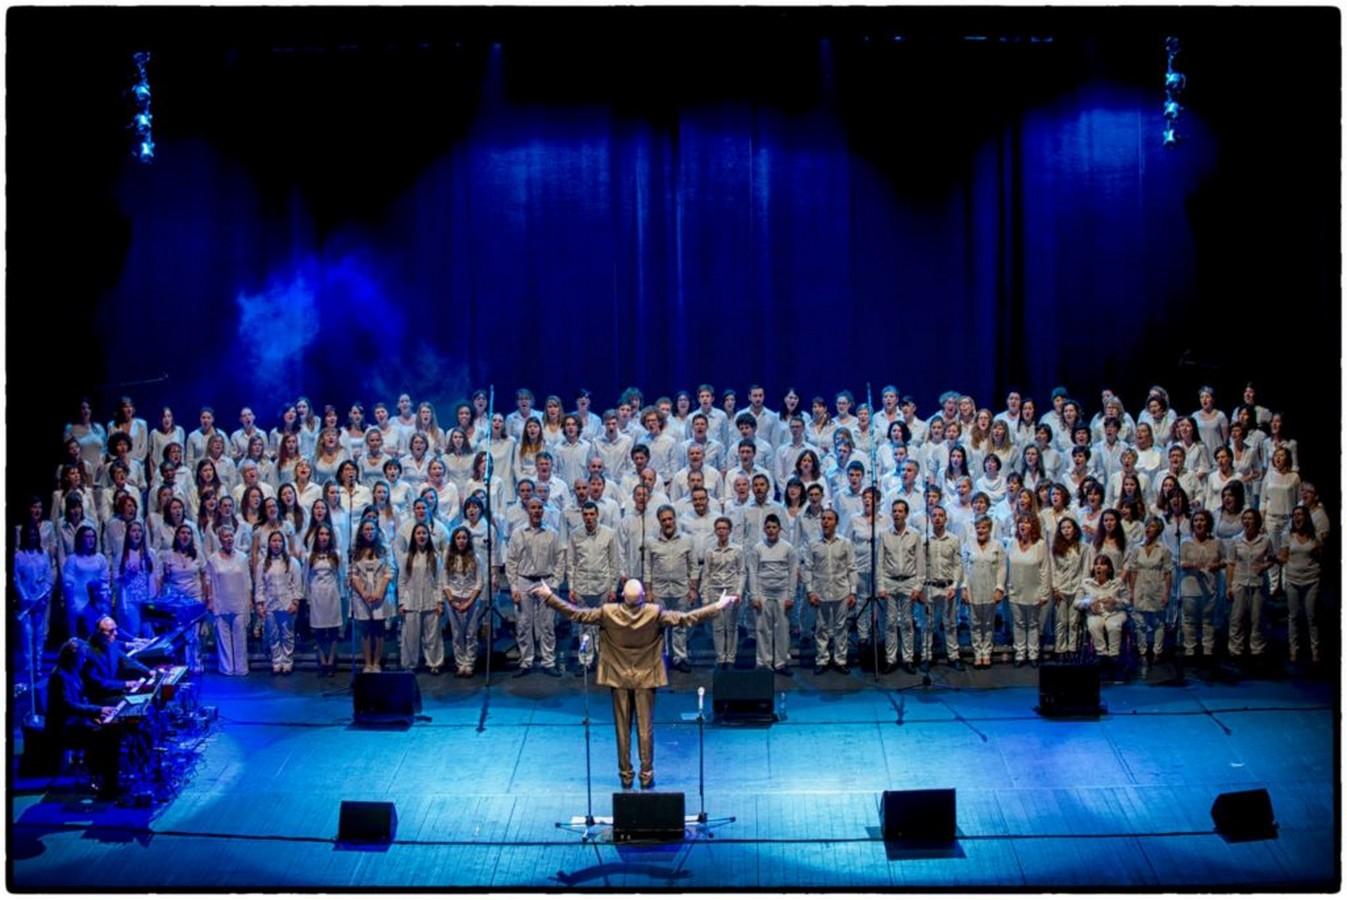 coro-powerfull-gospel